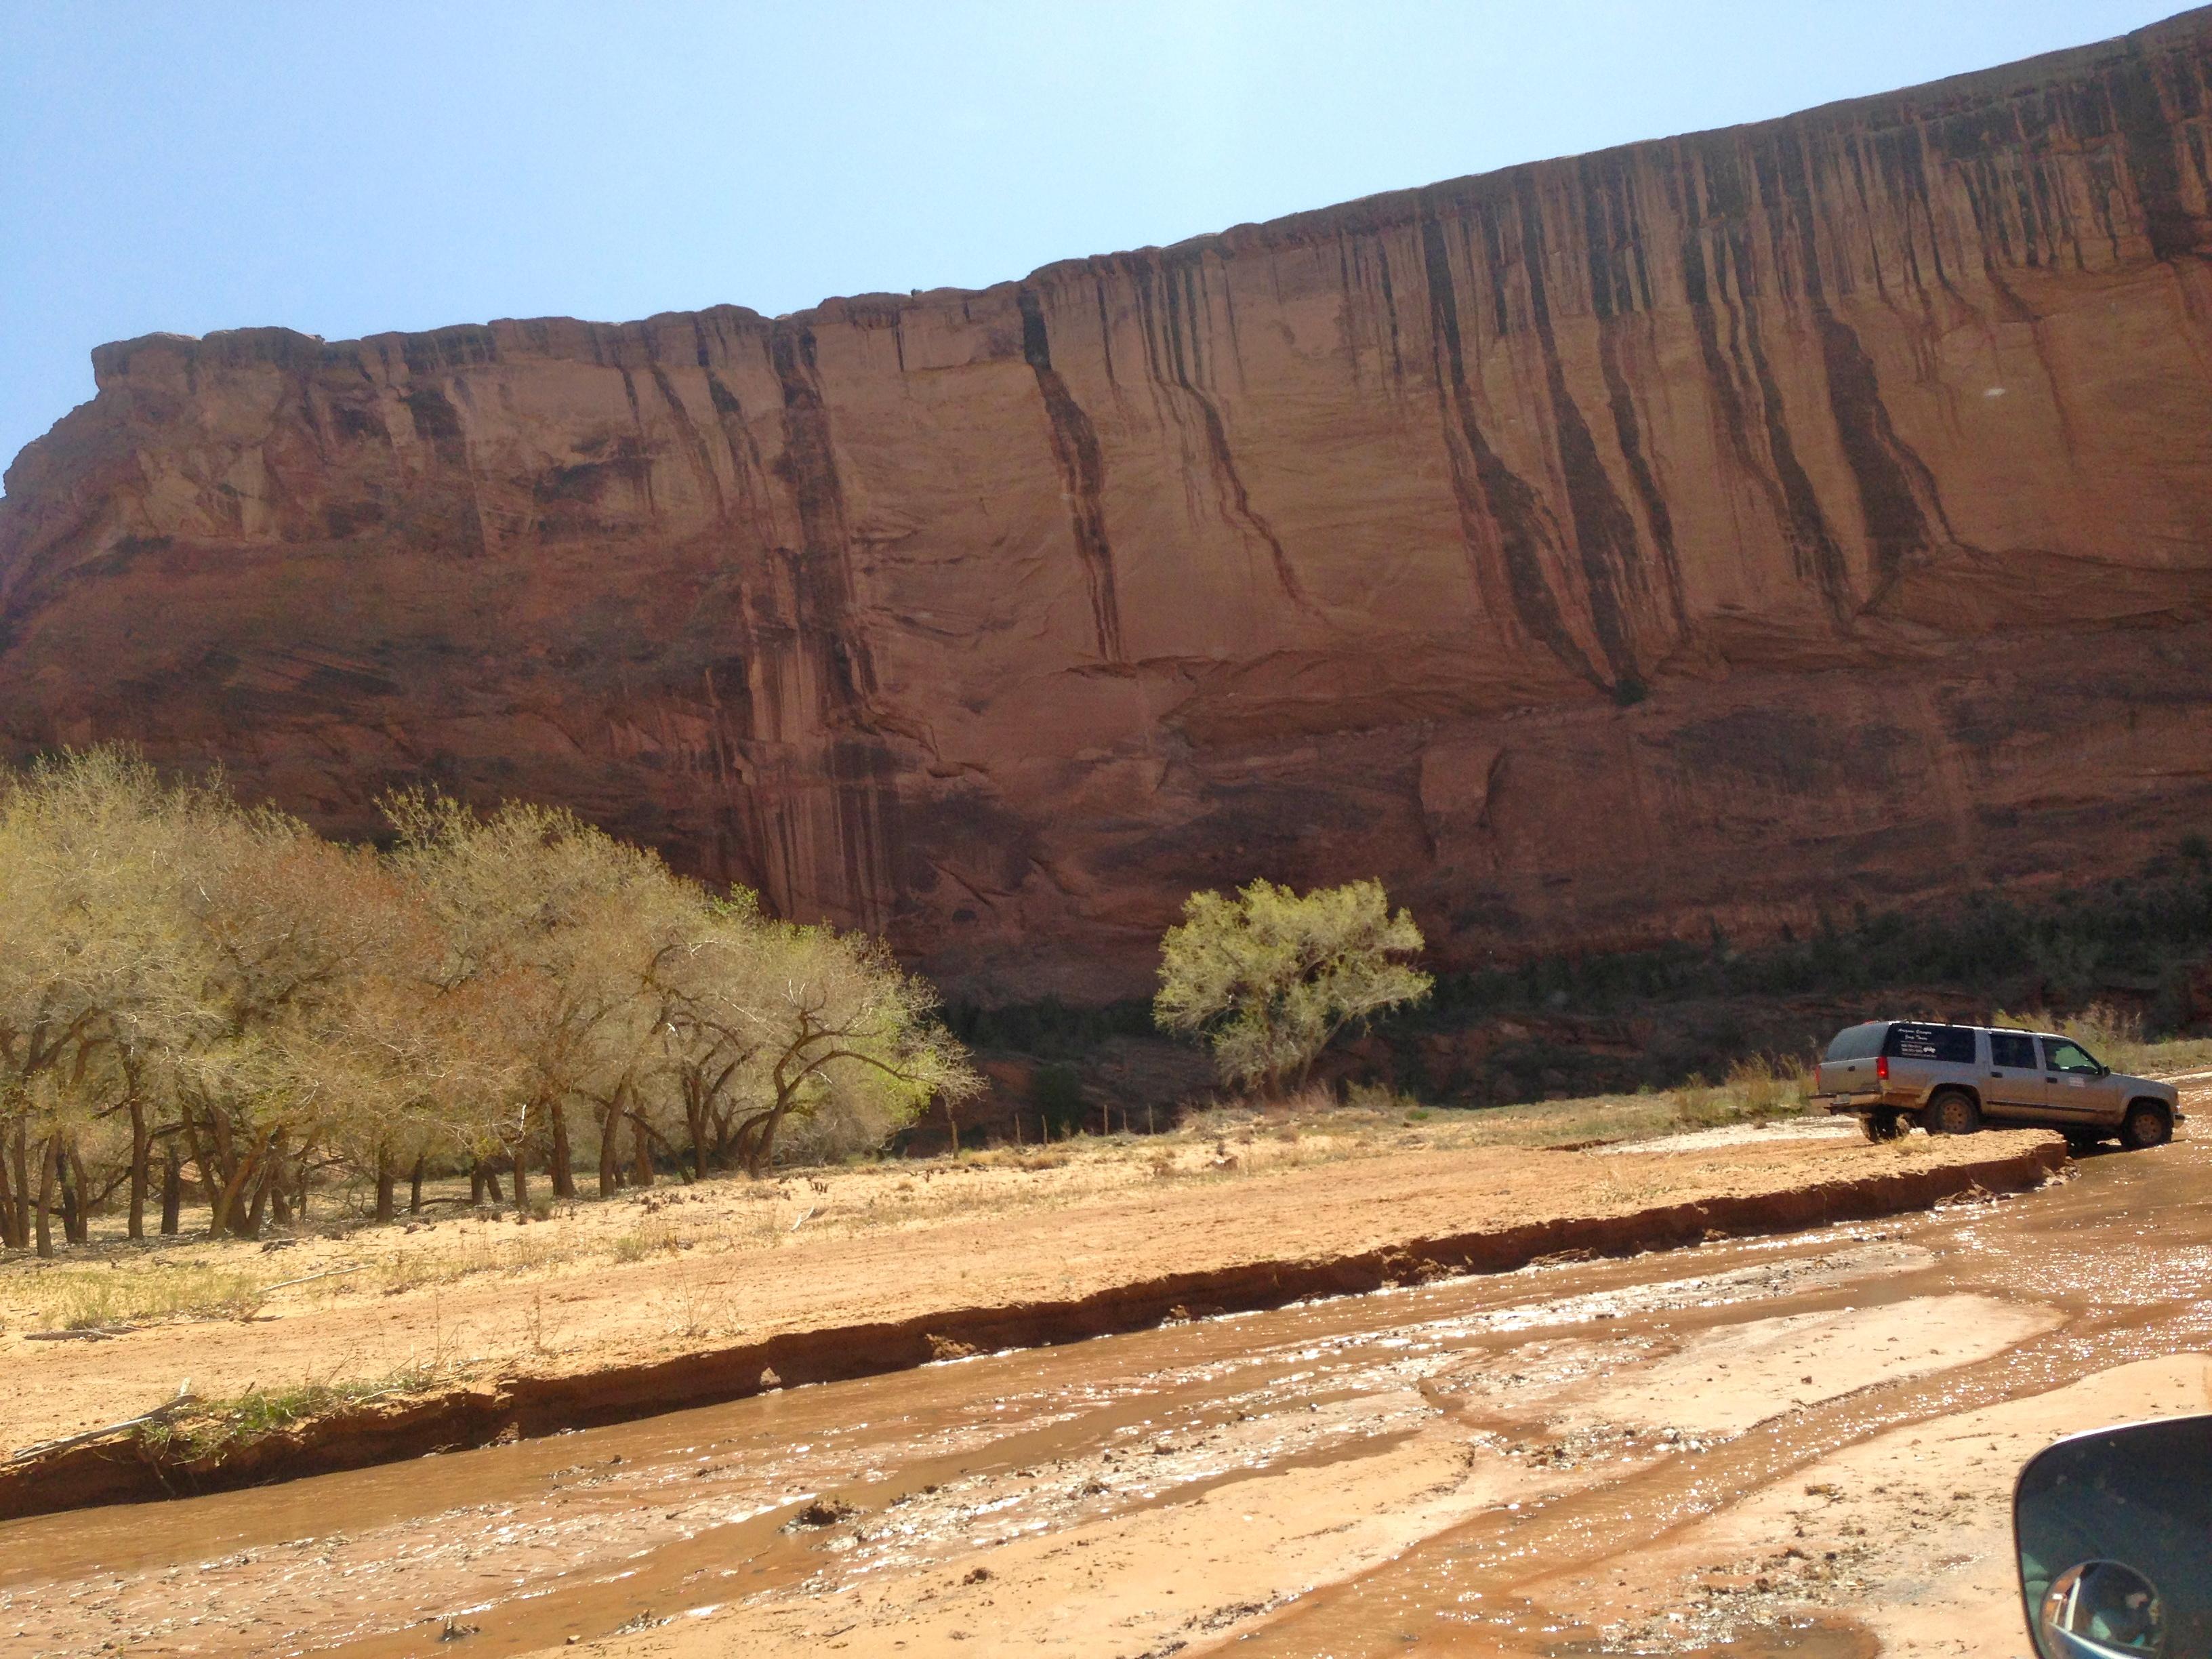 Jeep tours through Canyon de Chelly in Arizona